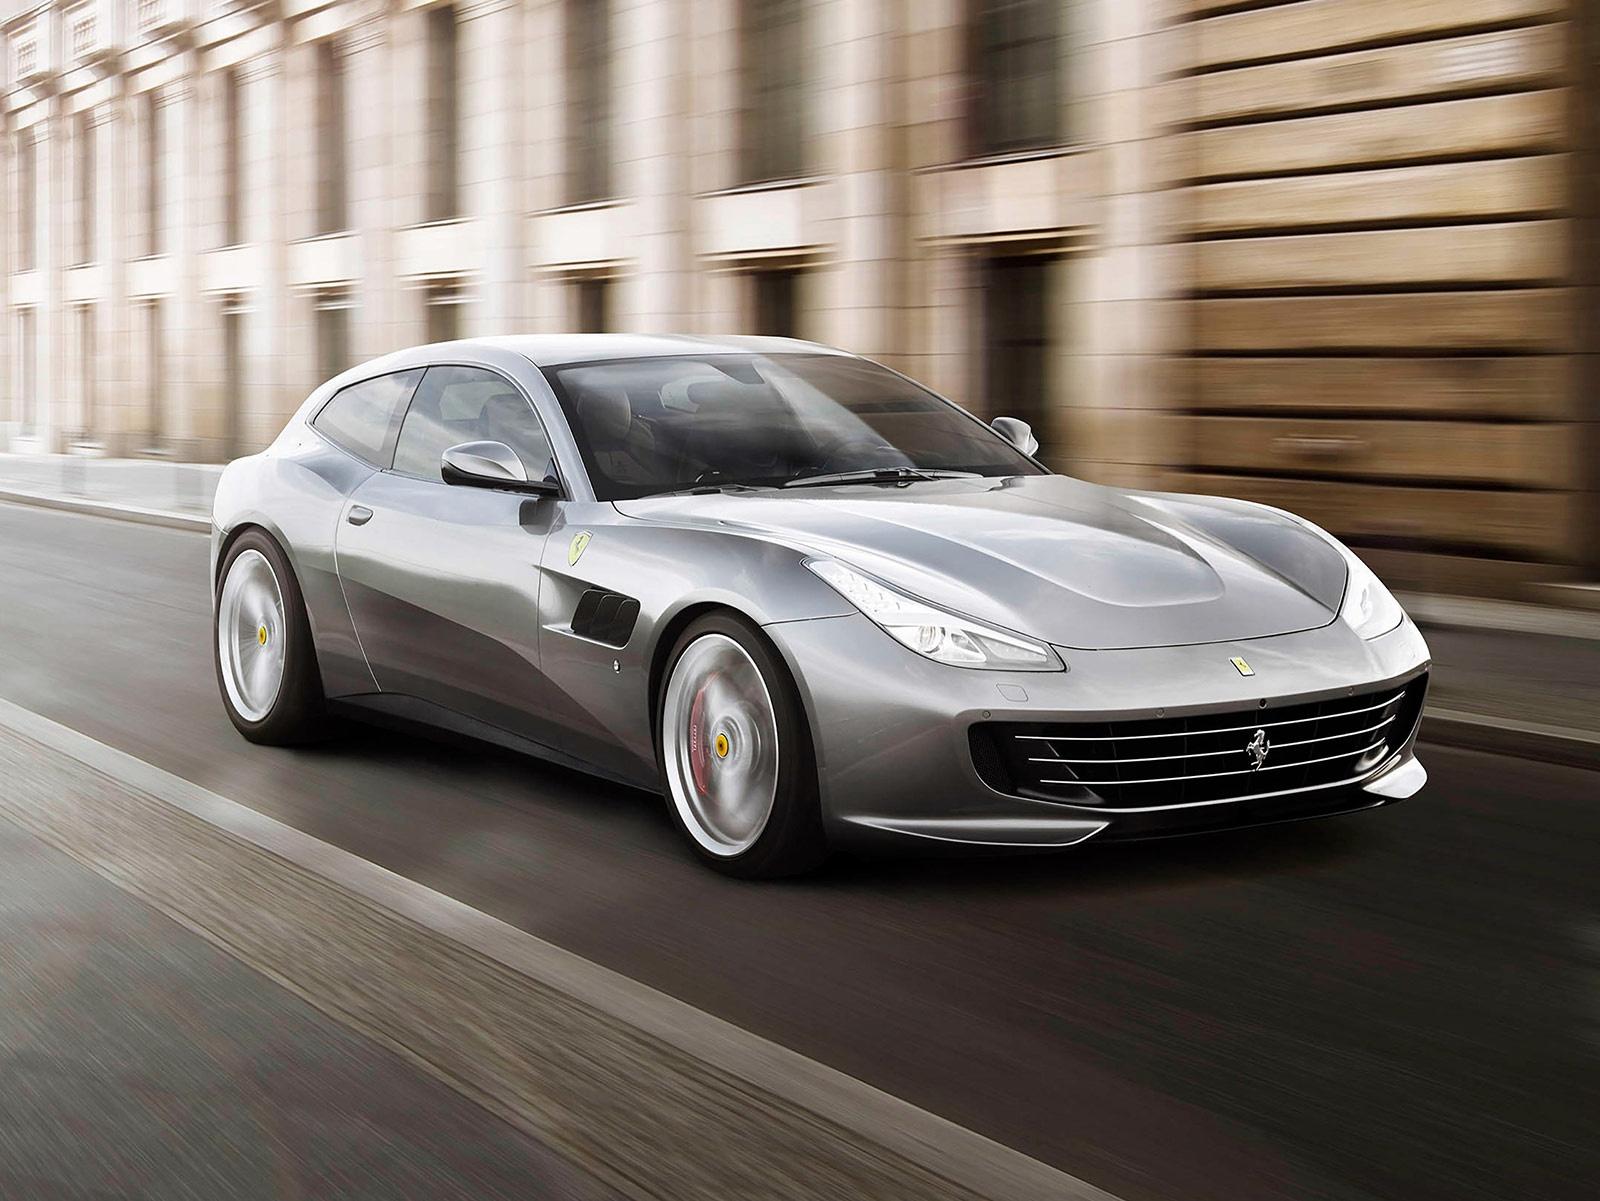 New 2020 Ferrari GTC4LussoT V8 For Sale 0 In Greenwich, CT